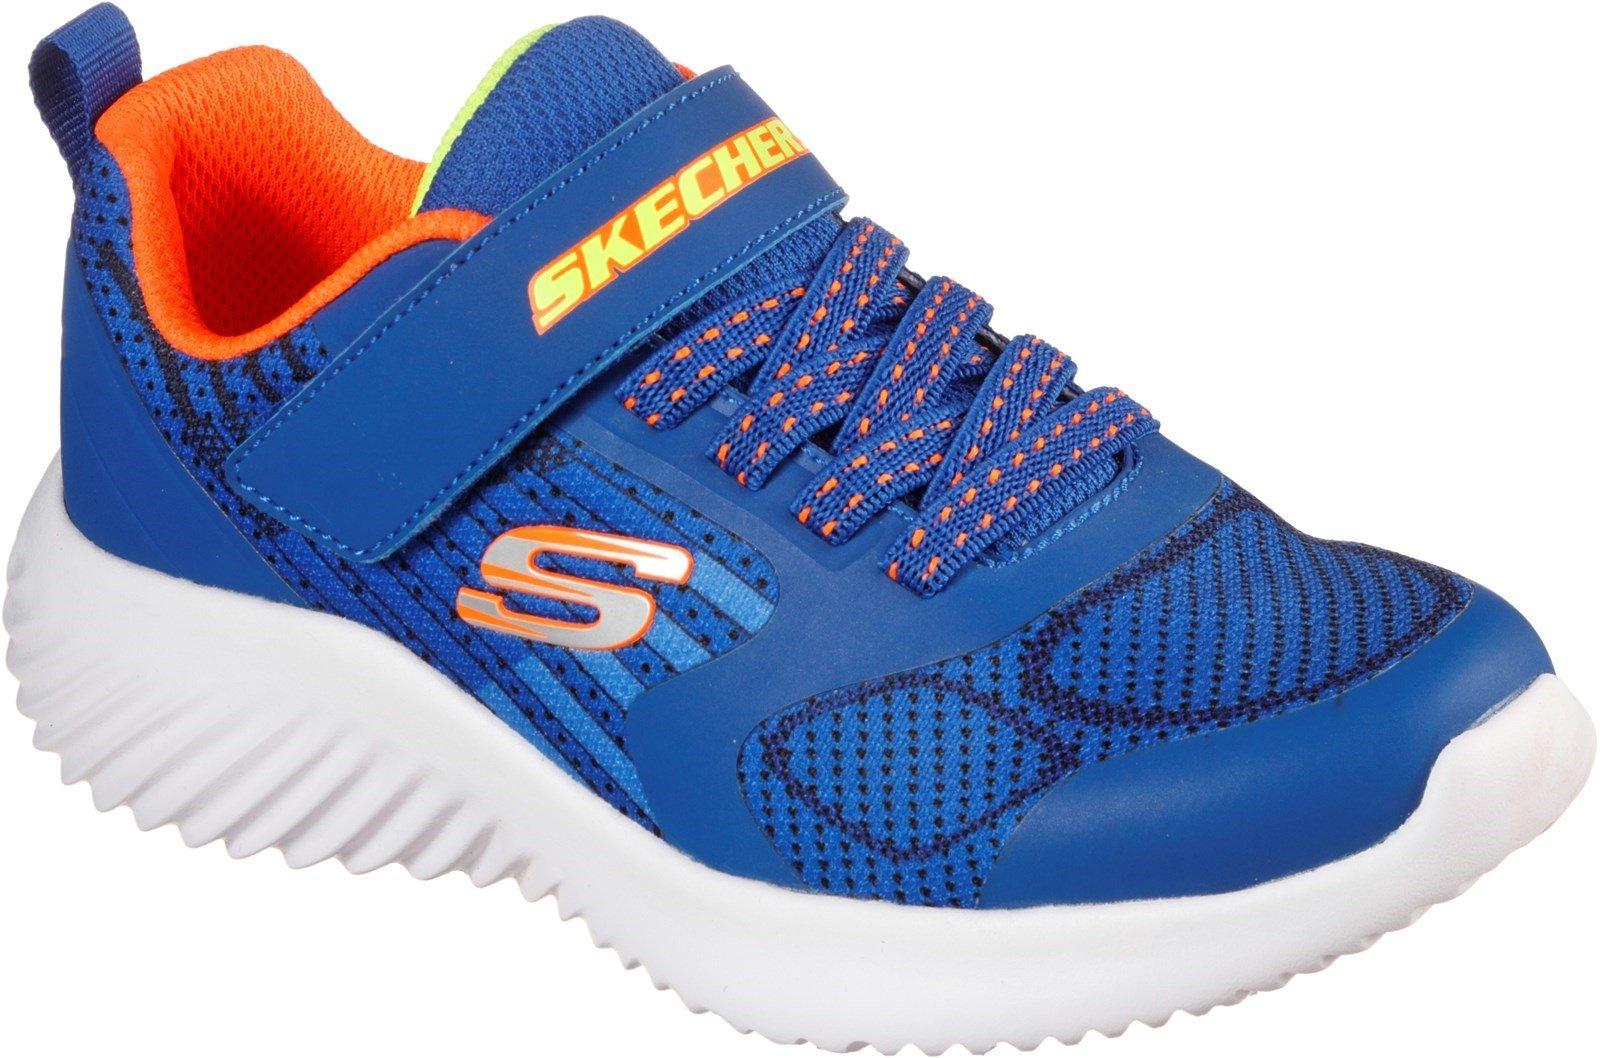 Skechers Kid's Bounder Gorven Sports Trainer Royal Orange 31177 - Royal Orange 5